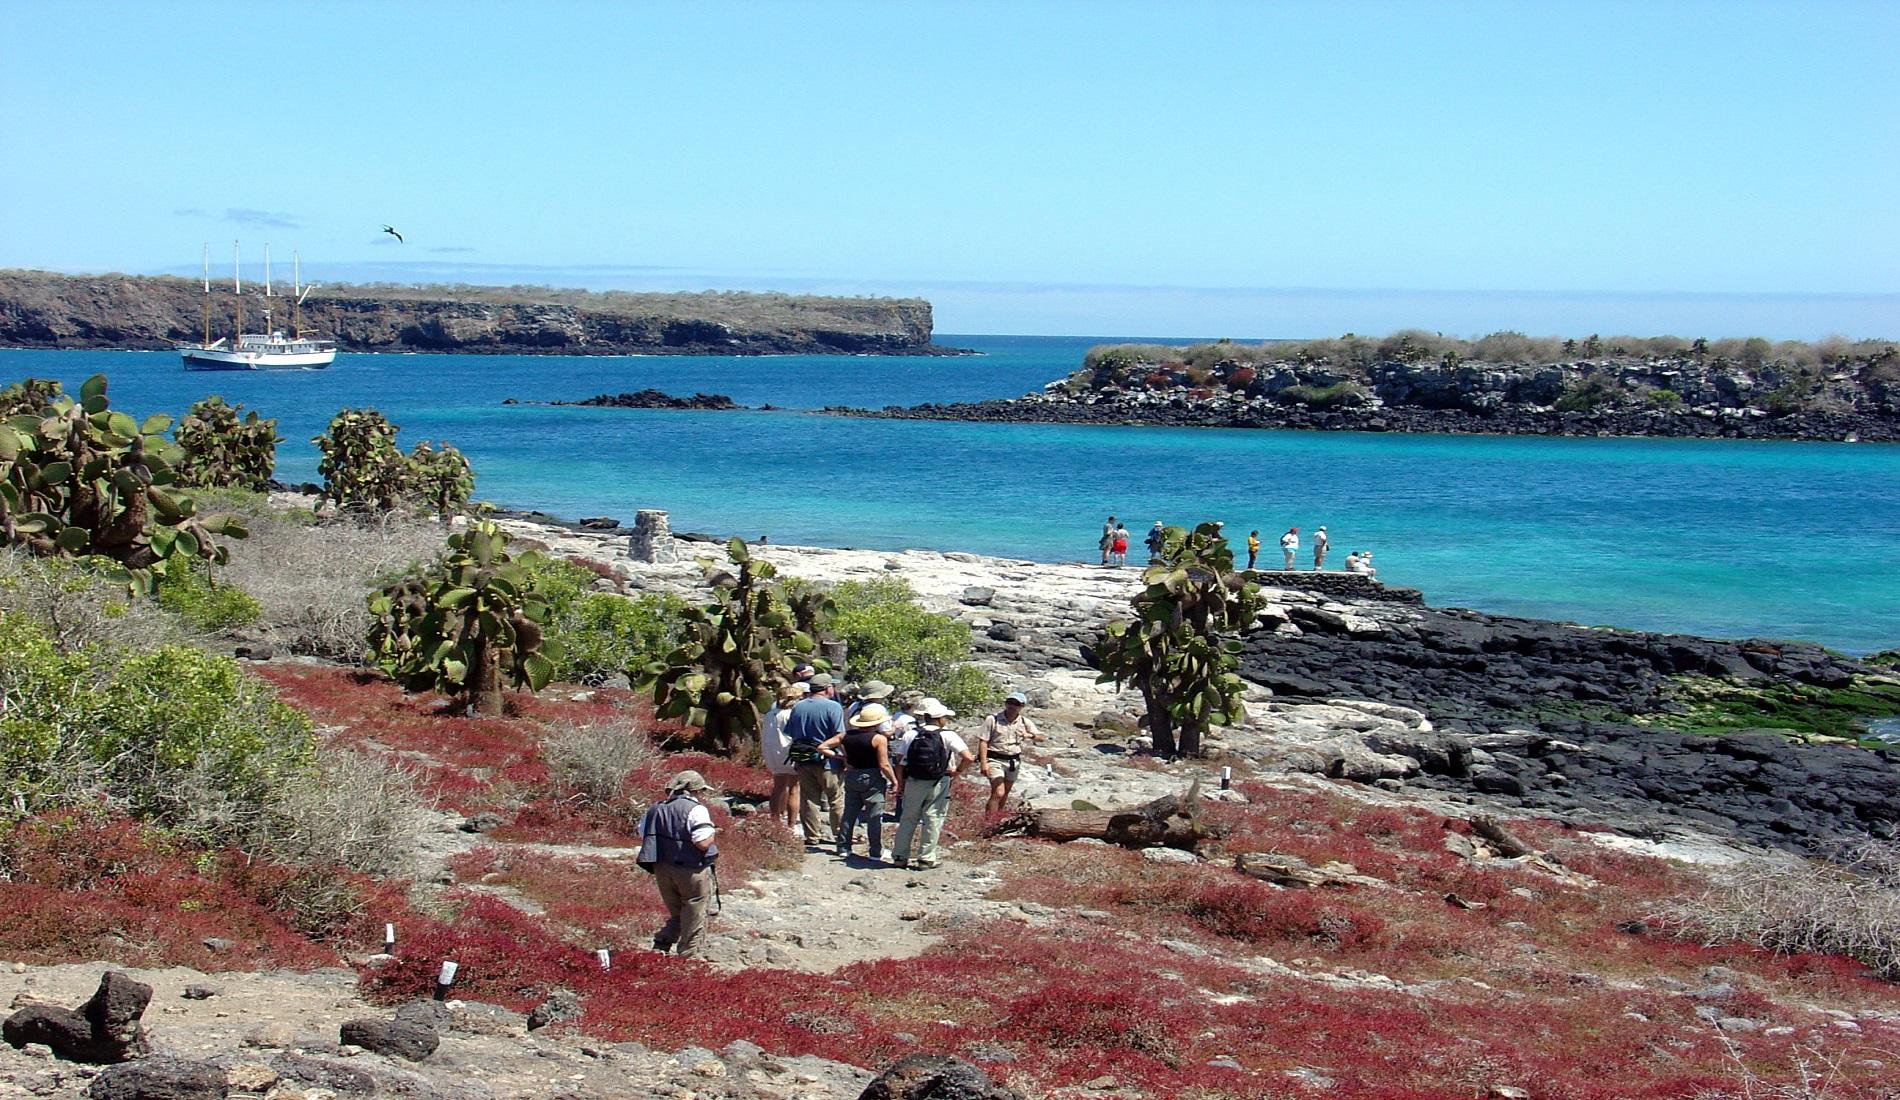 South Plazas Island eilandhoppen galapagos eilanden